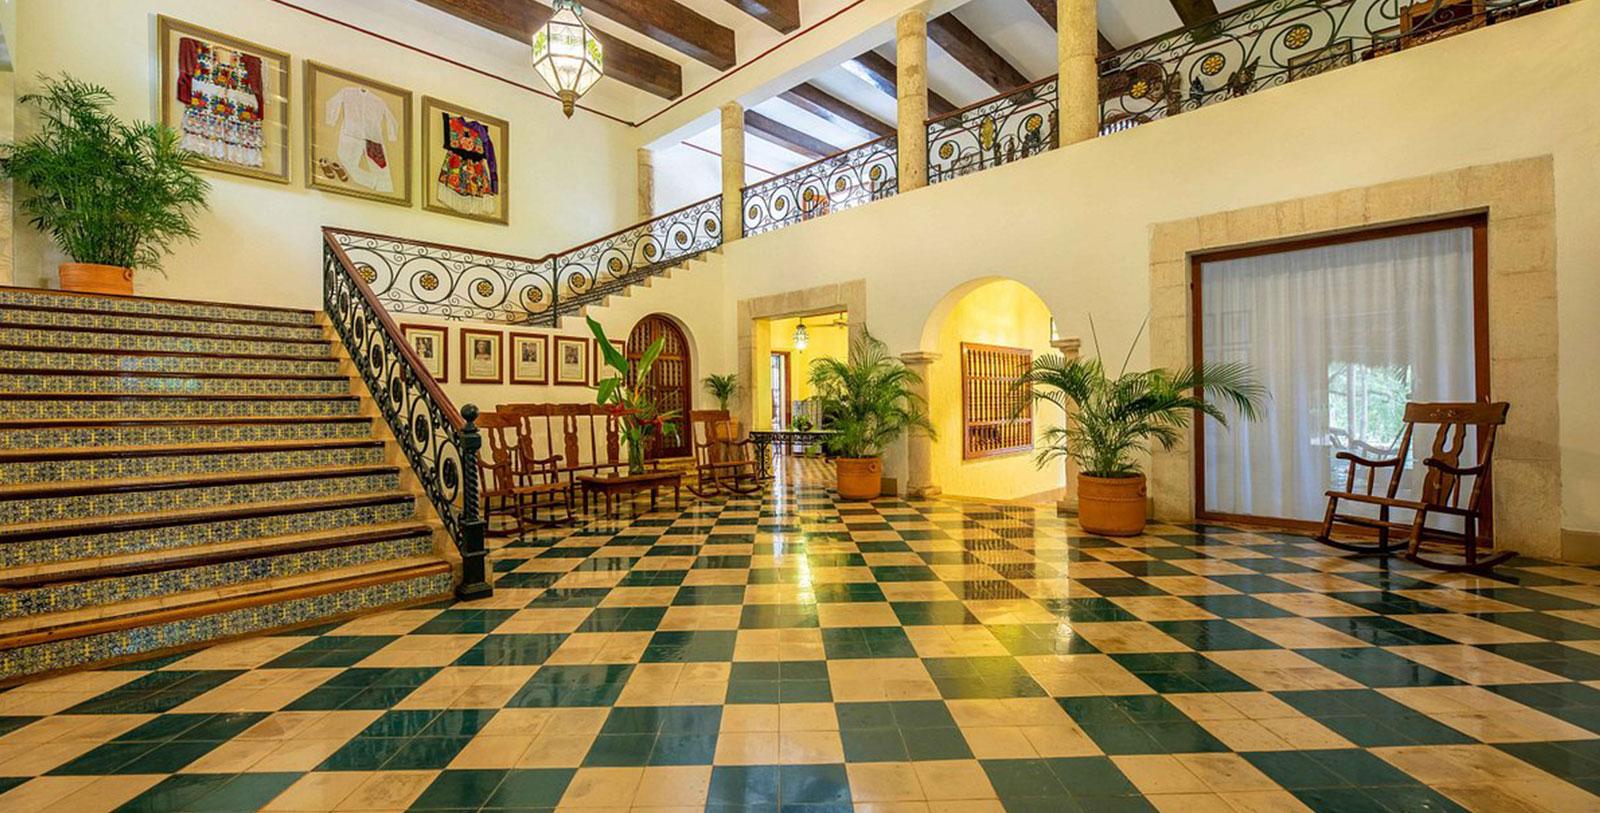 Image of Interior Lobby, Hacienda Uxmal Plantation & Museum, Member of Historic Hotels Worldwide, Overview